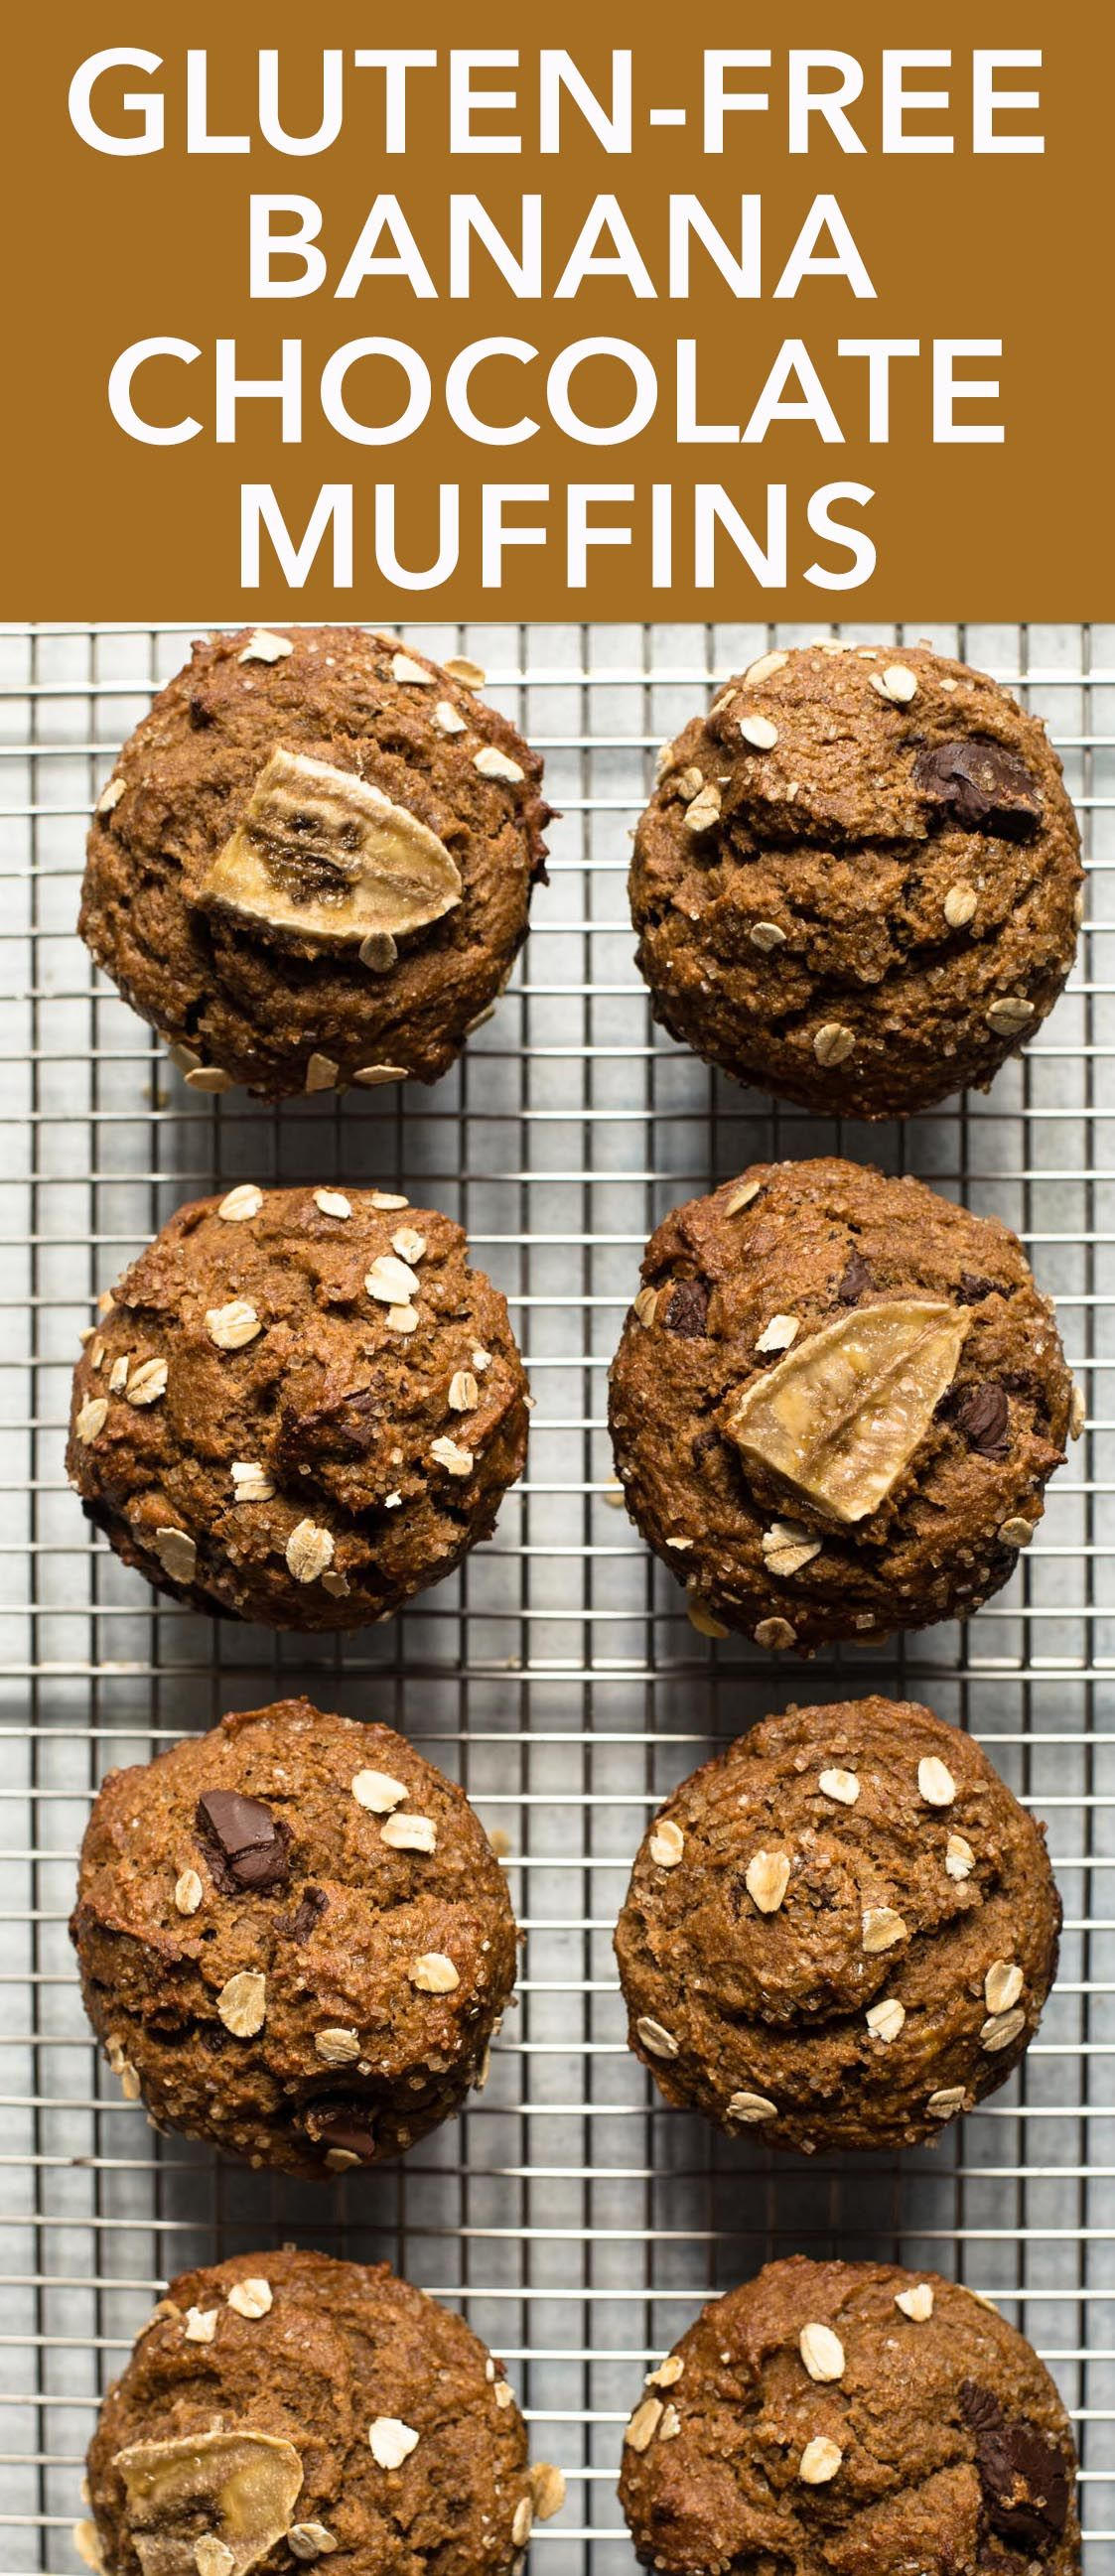 Glutenfree oat flour banana chocolate muffins recipe